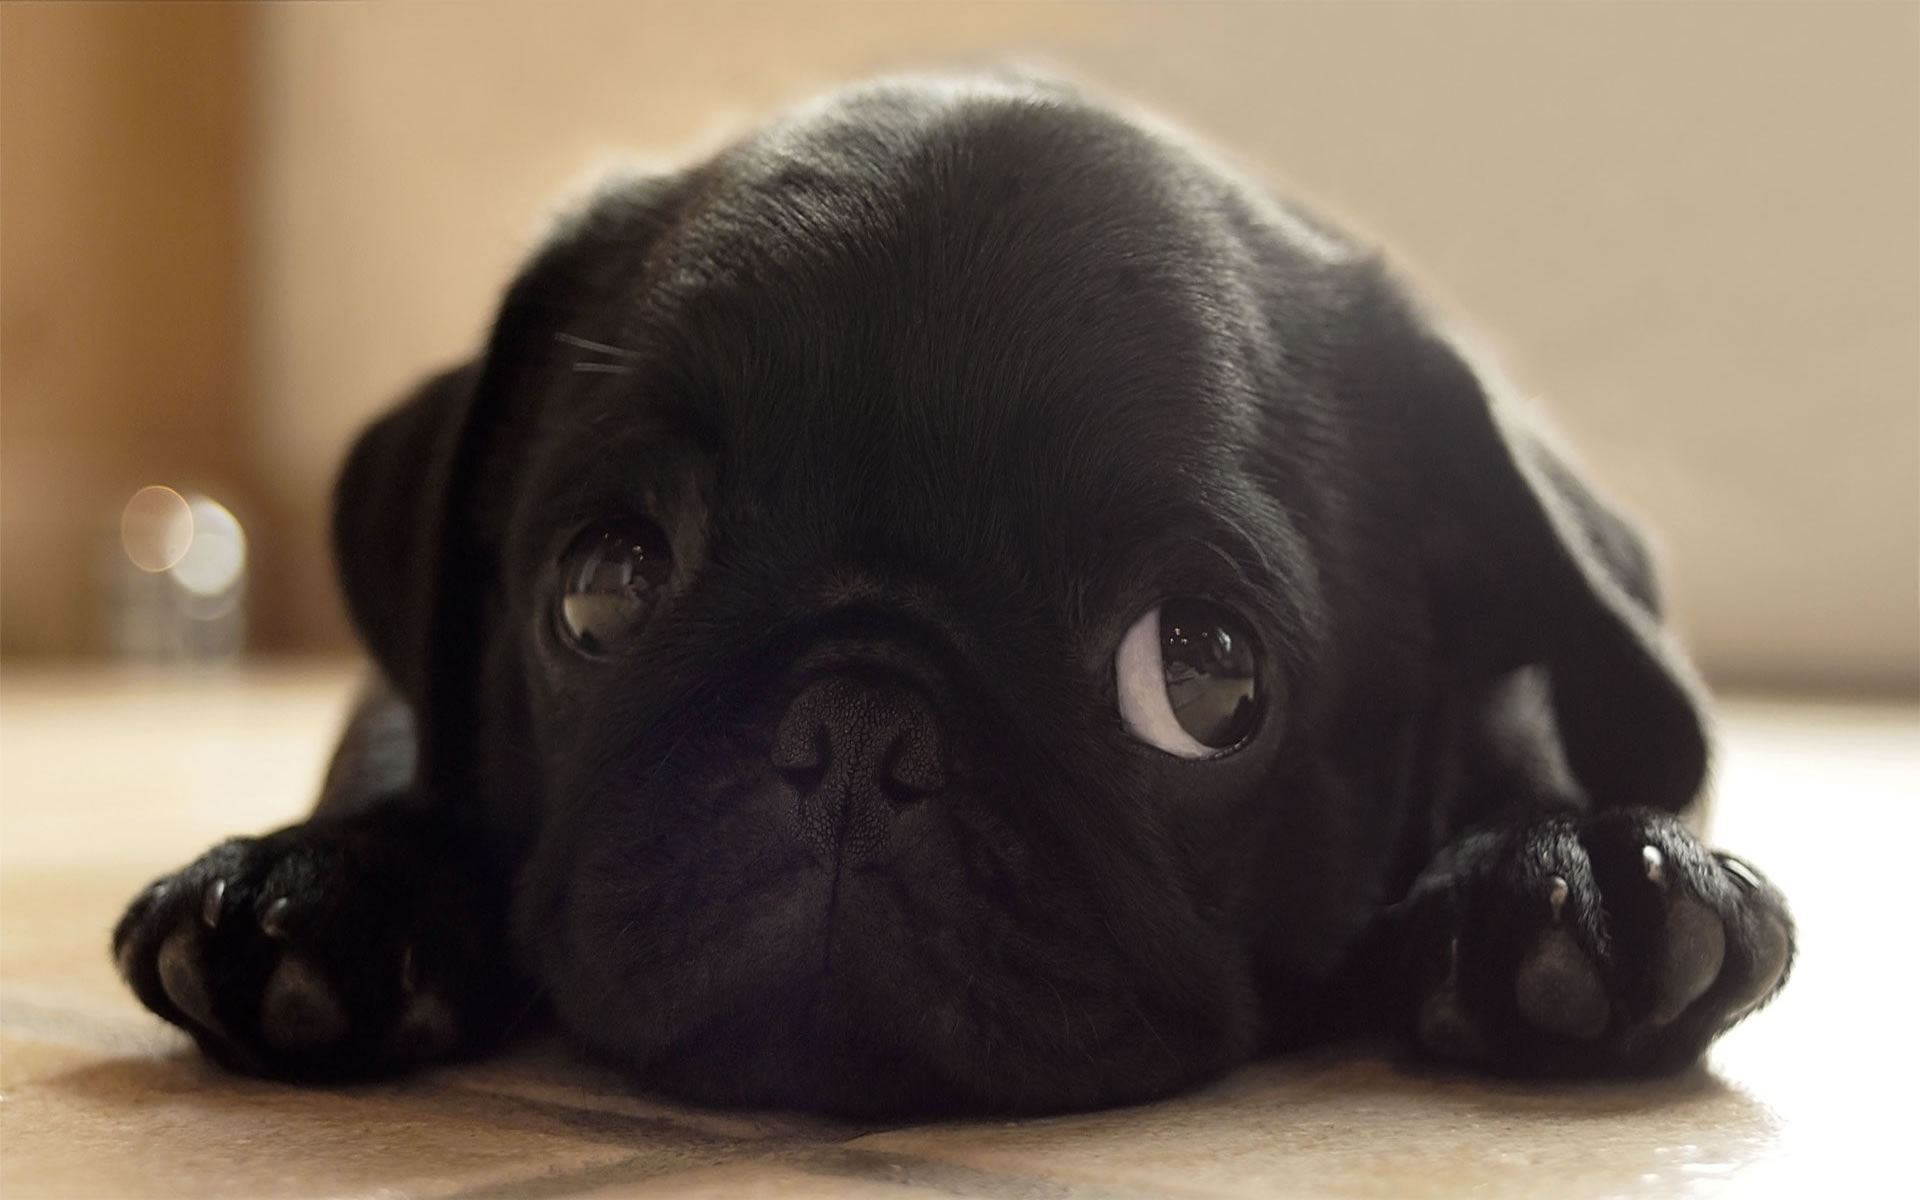 Download Pug Dog Hd Wallpaper Gallery: Wallpapers